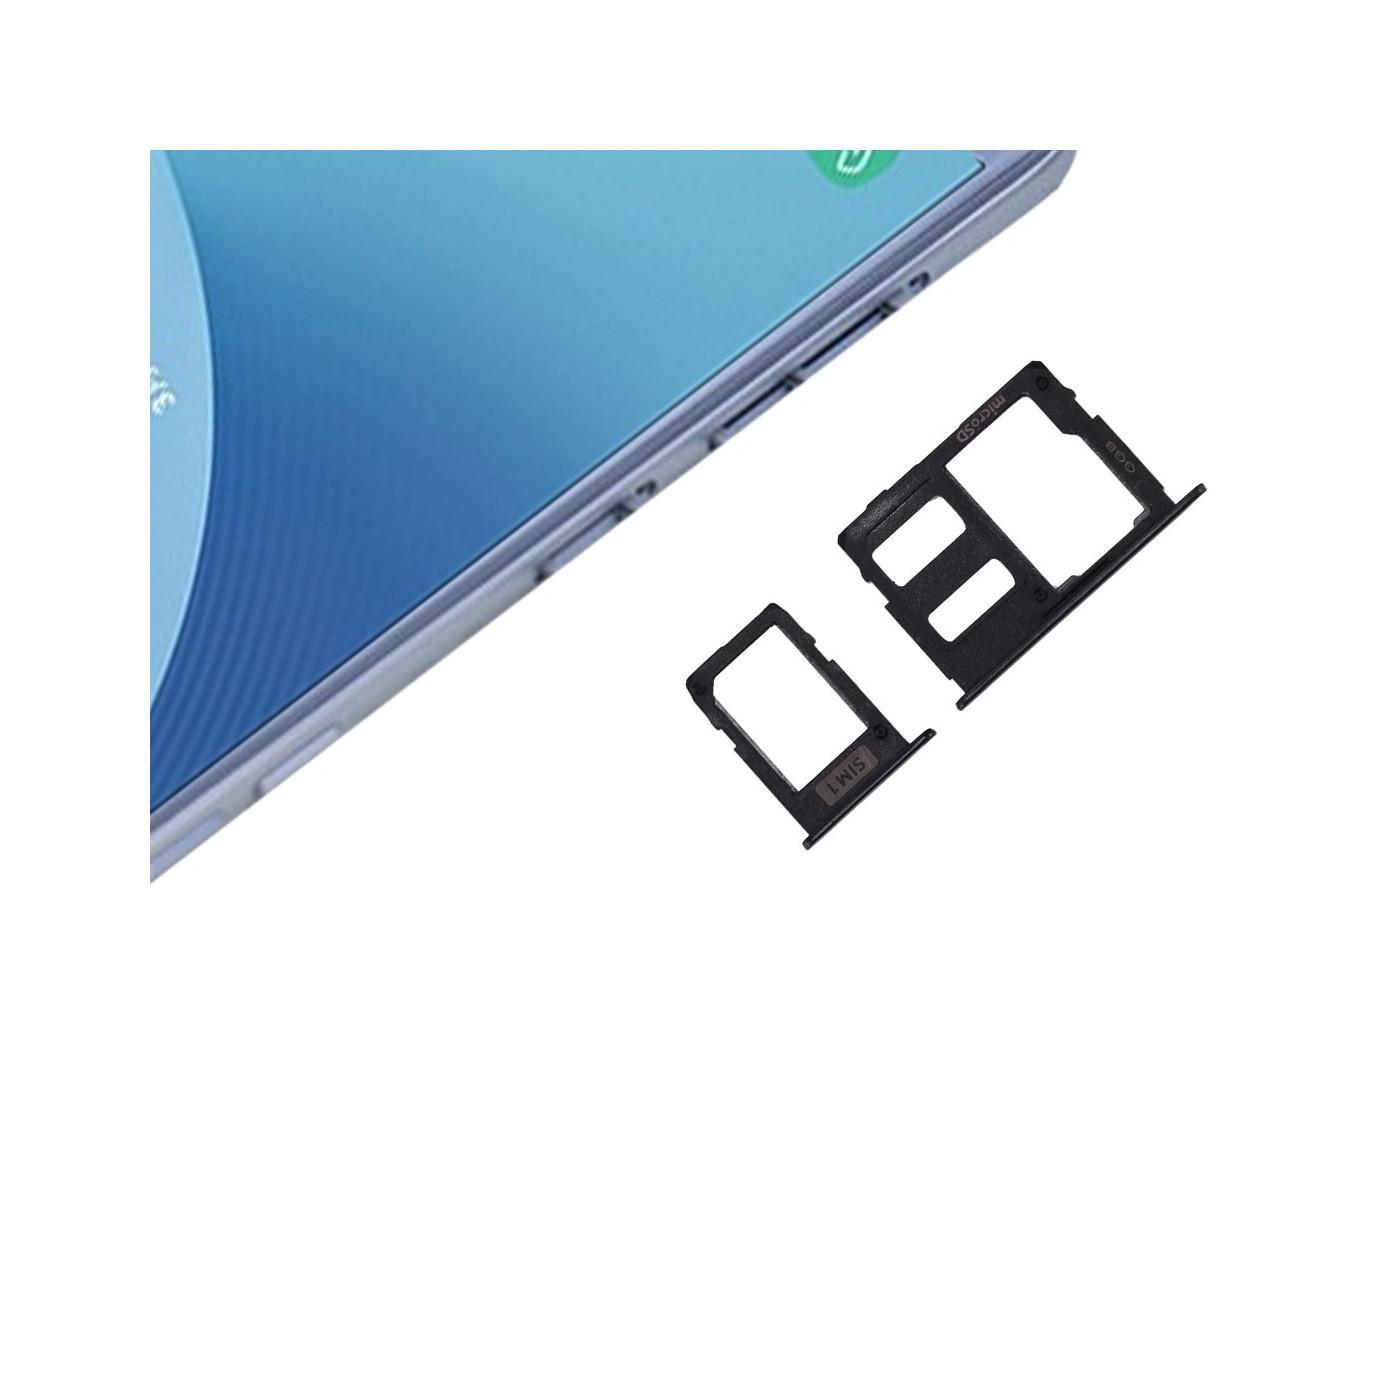 Porta SIM Singola + Scheda SD Nero J3 - J5 - J7 2017 Slot Slitta